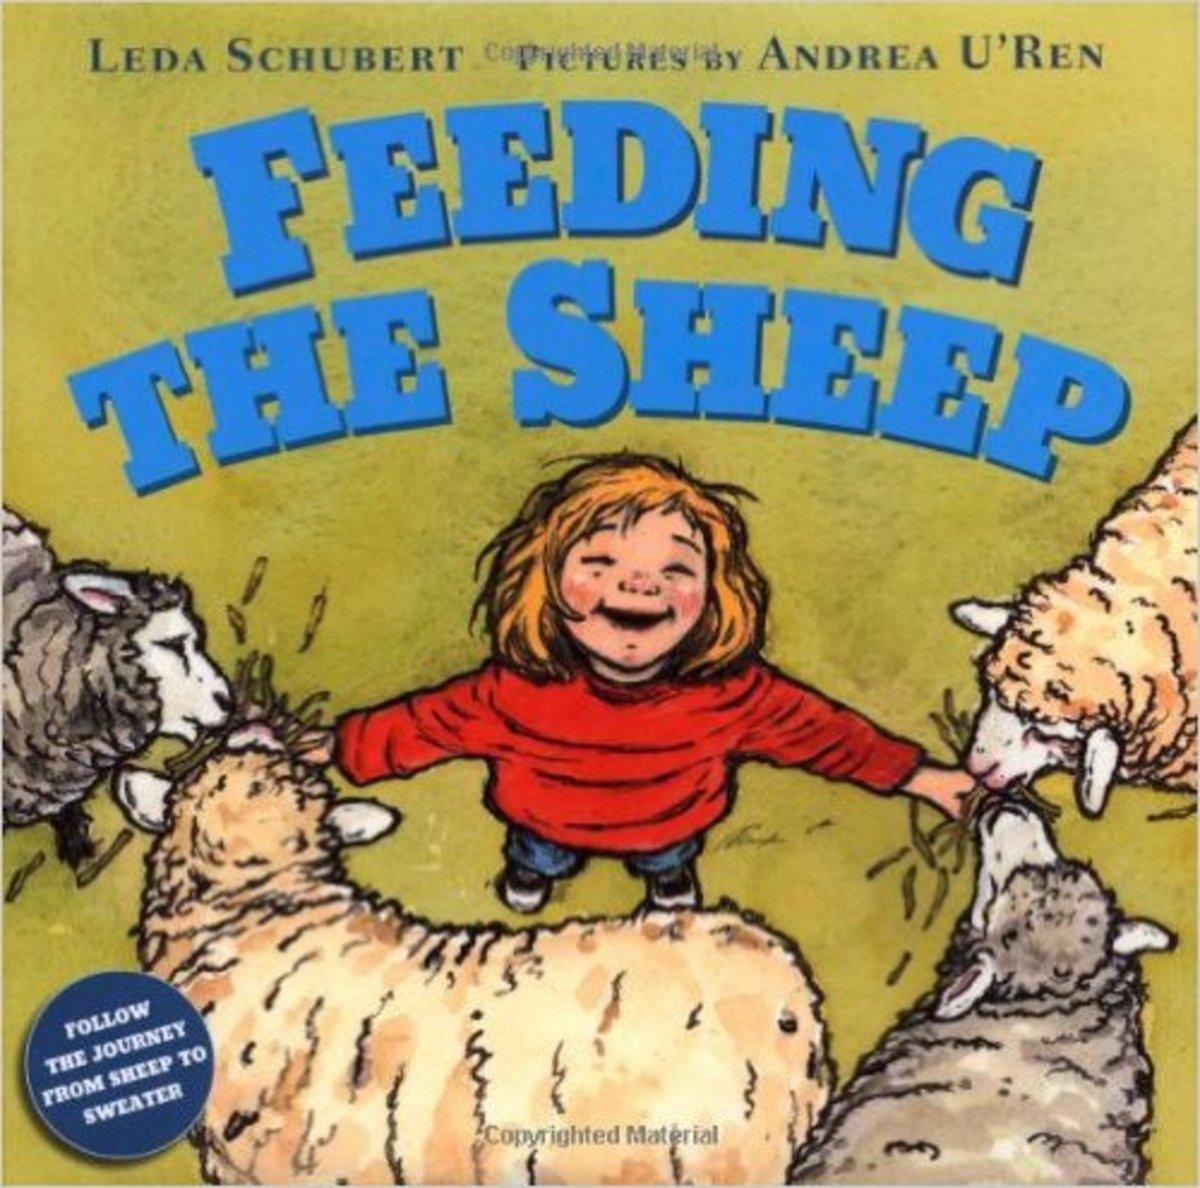 Feeding the Sheep by Leda Schubert